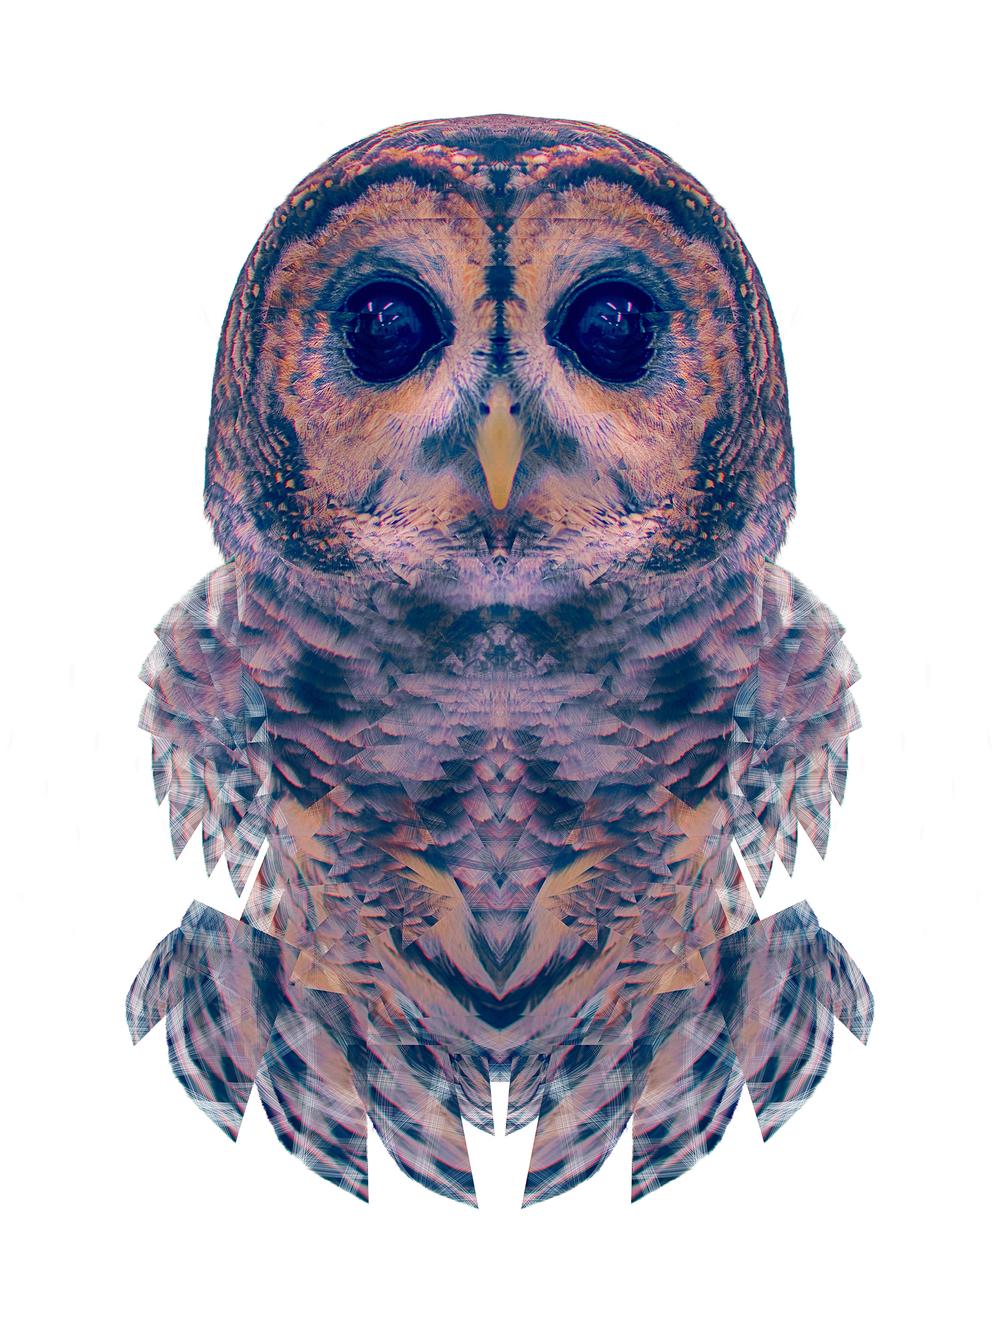 Animalia: Barred Owl